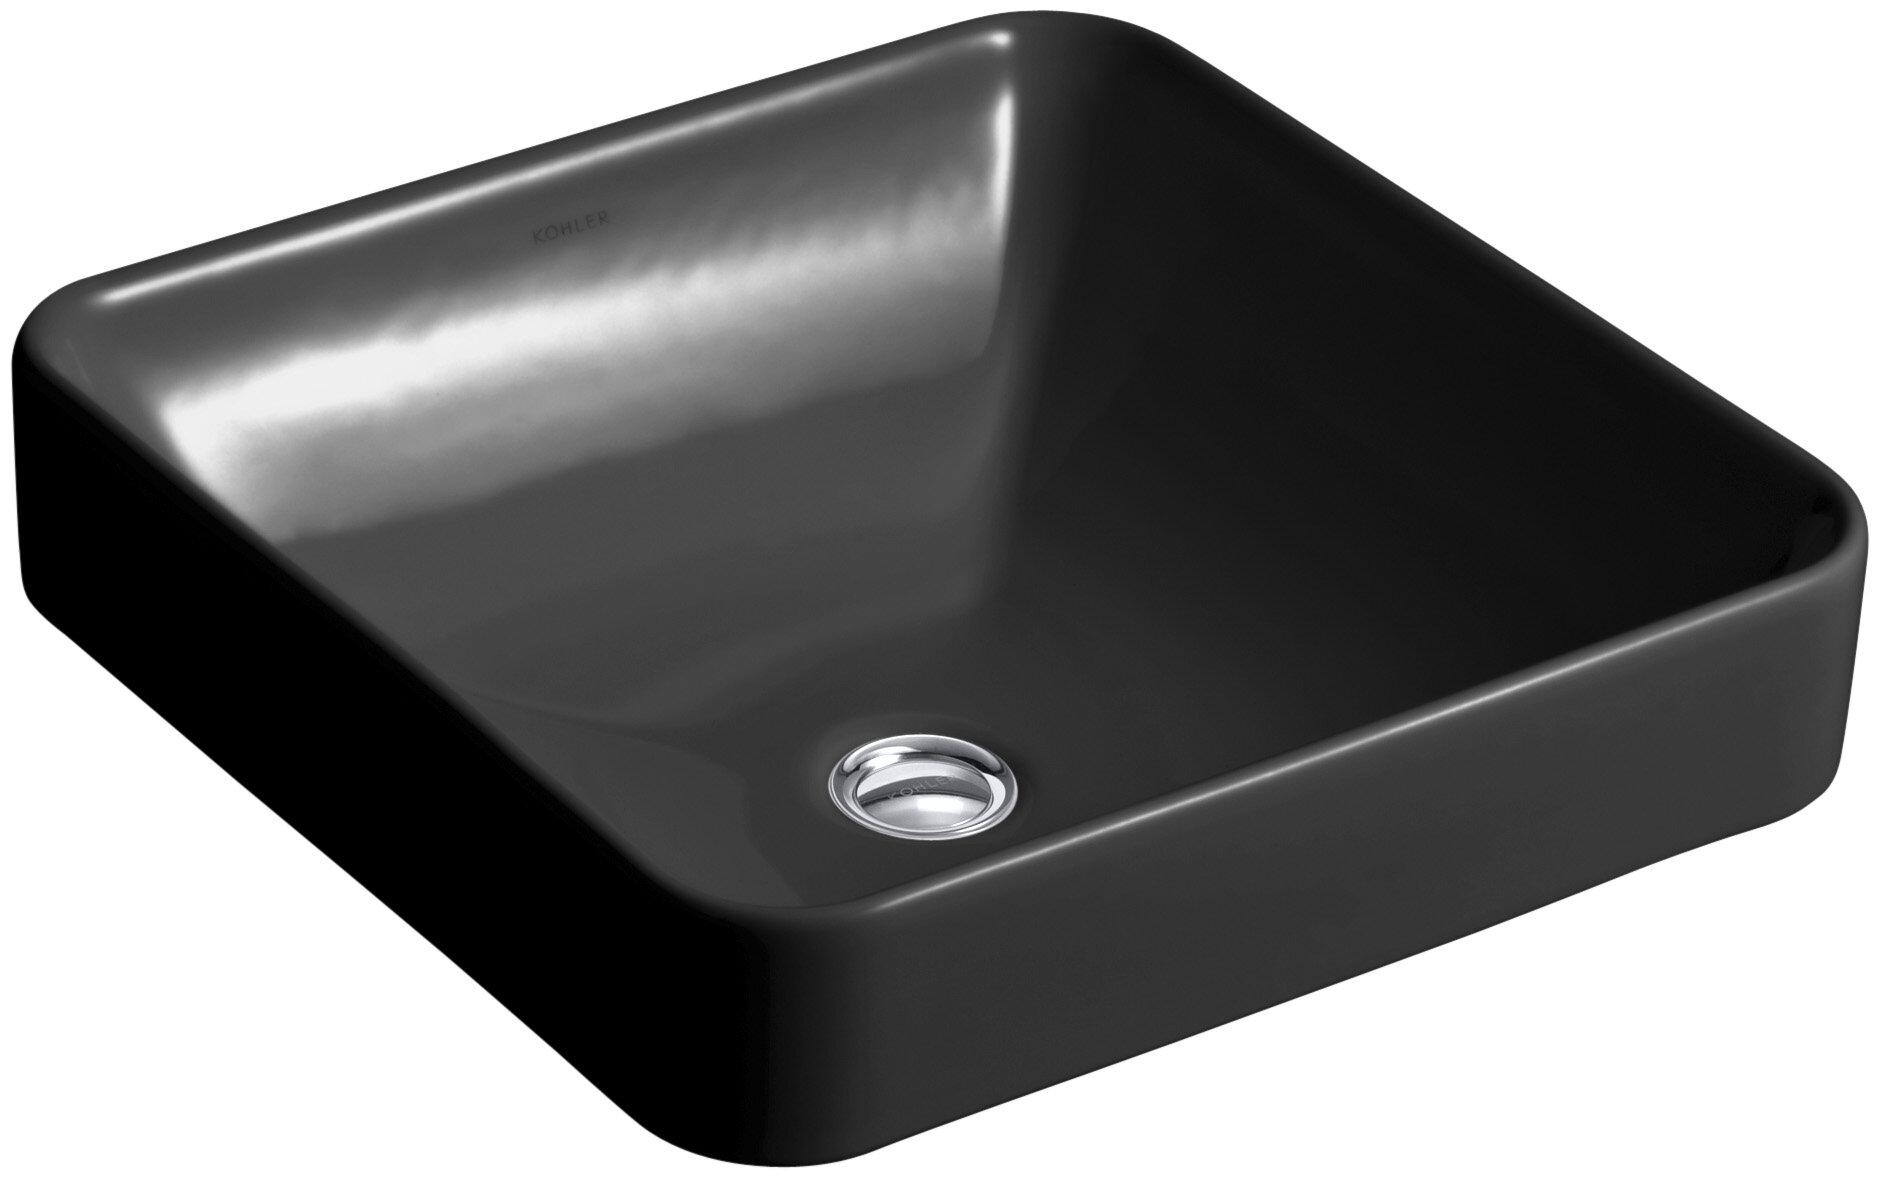 Vox Ceramic Square Vessel Bathroom Sink With Overflow Reviews Allmodern